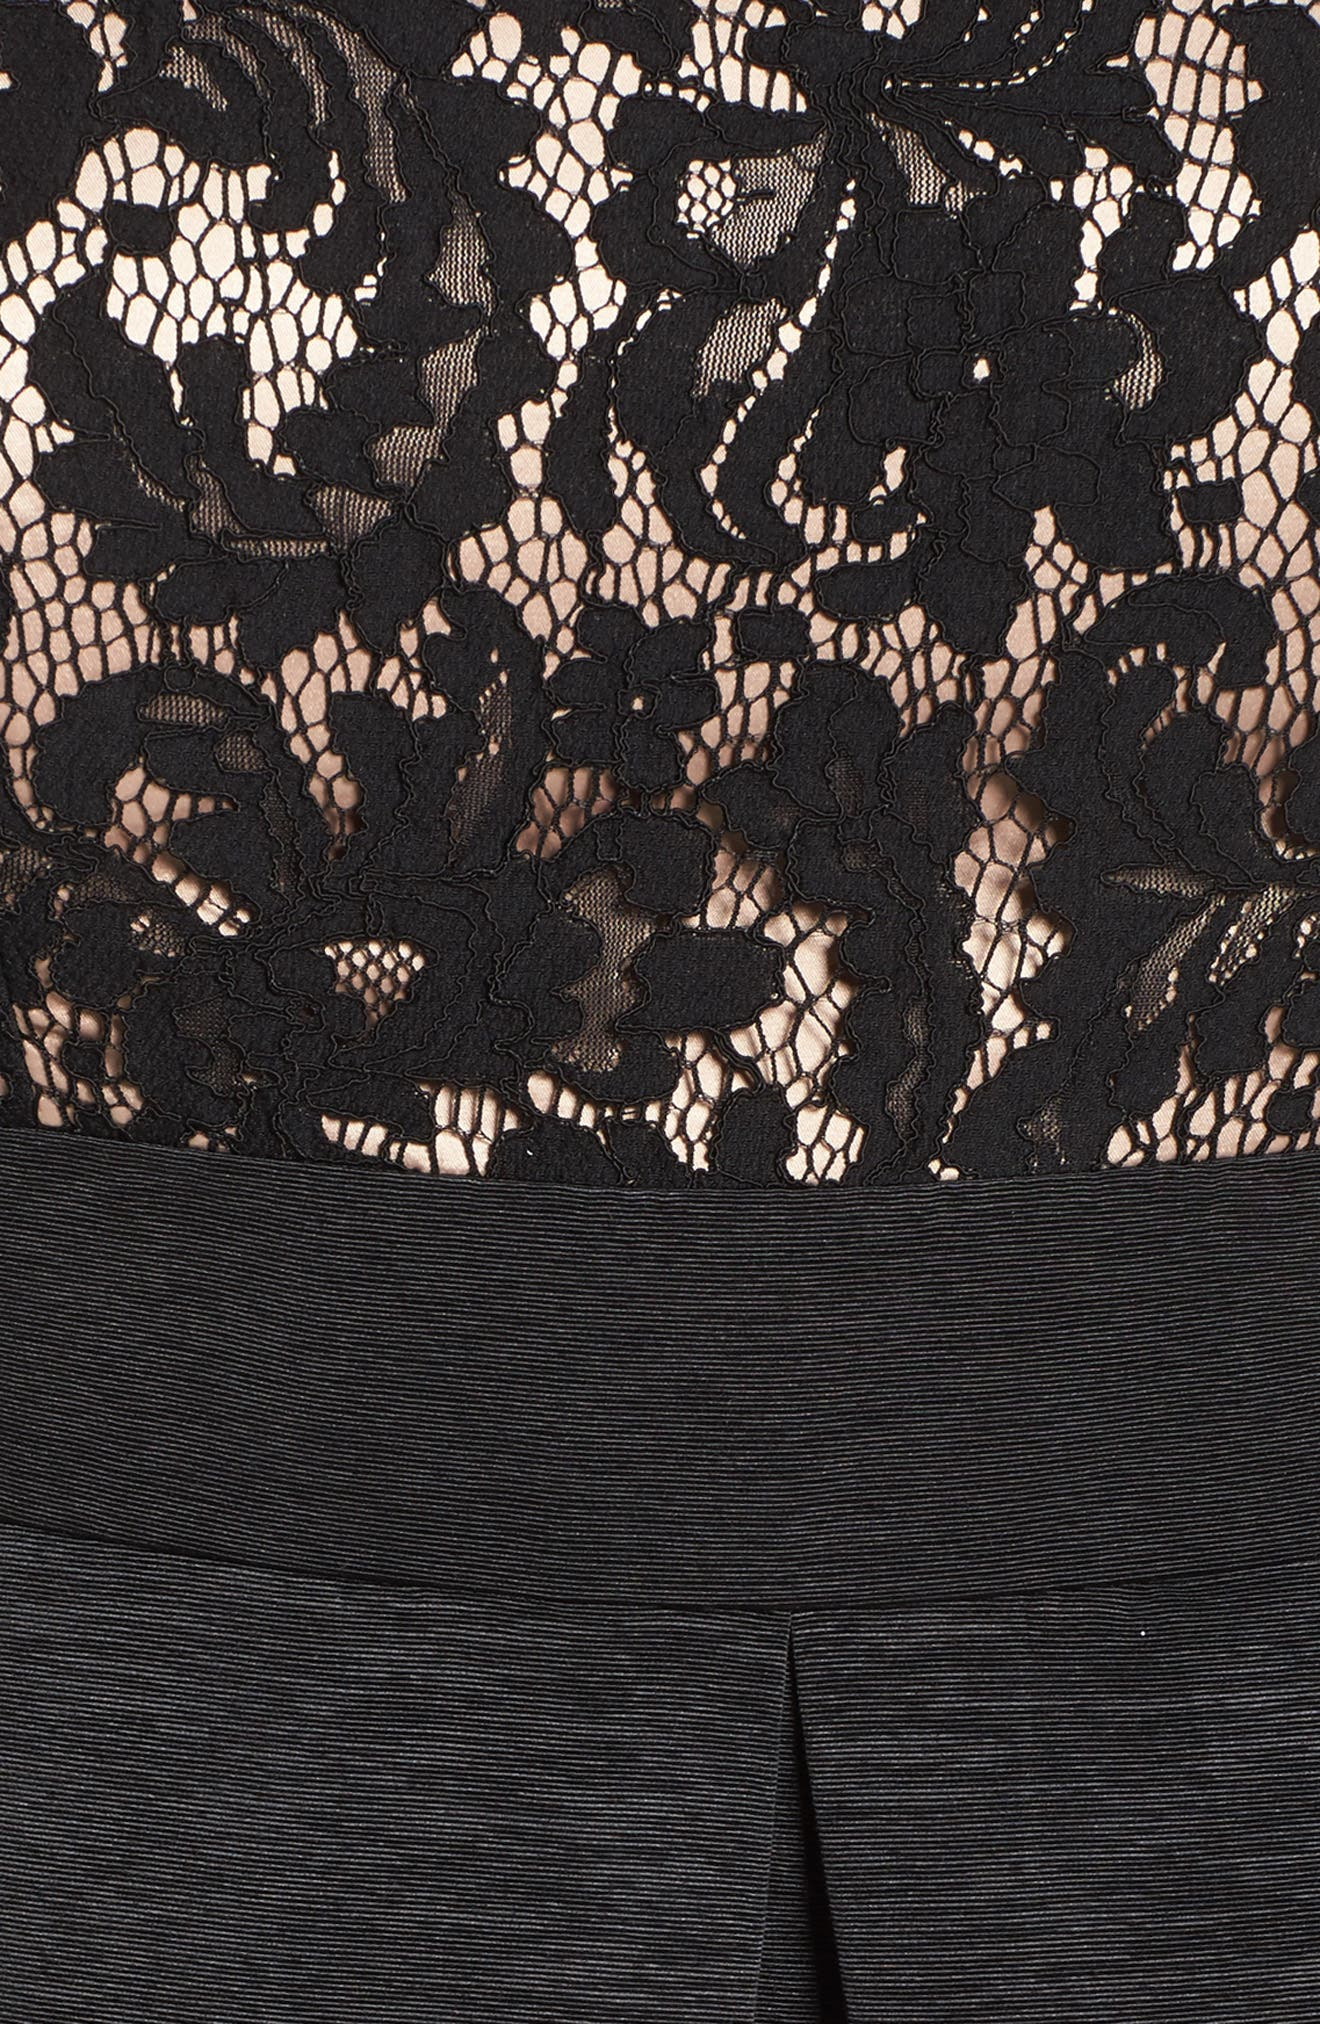 Off the Shoulder A-Line Dress,                             Alternate thumbnail 5, color,                             BLACK